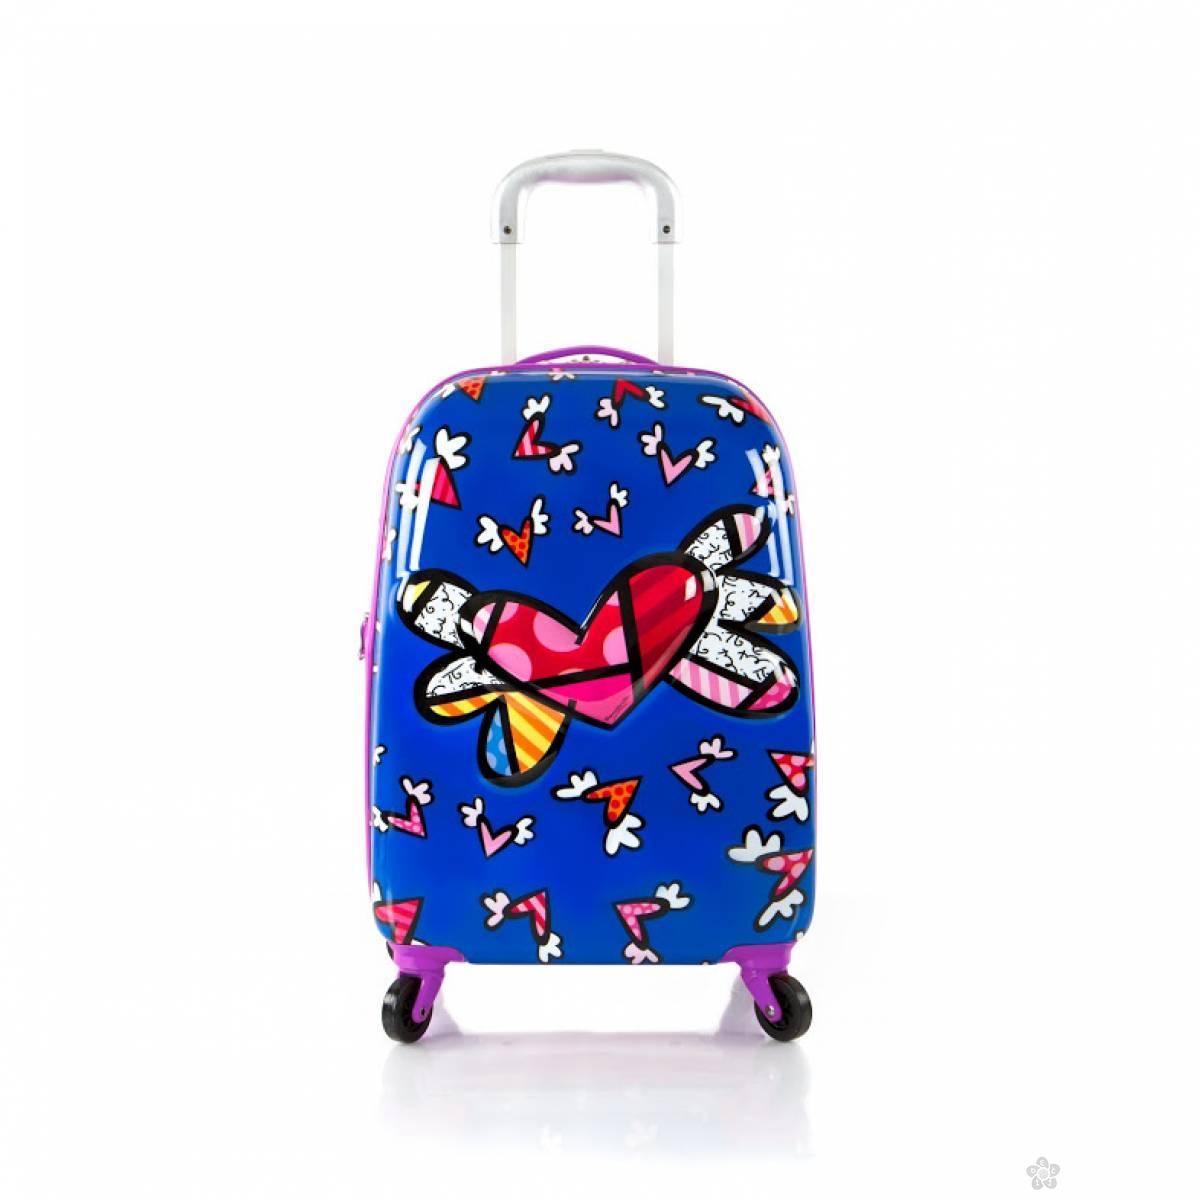 Deciji kofer Flying Hearts (Purple Trim) 16152-6935-20